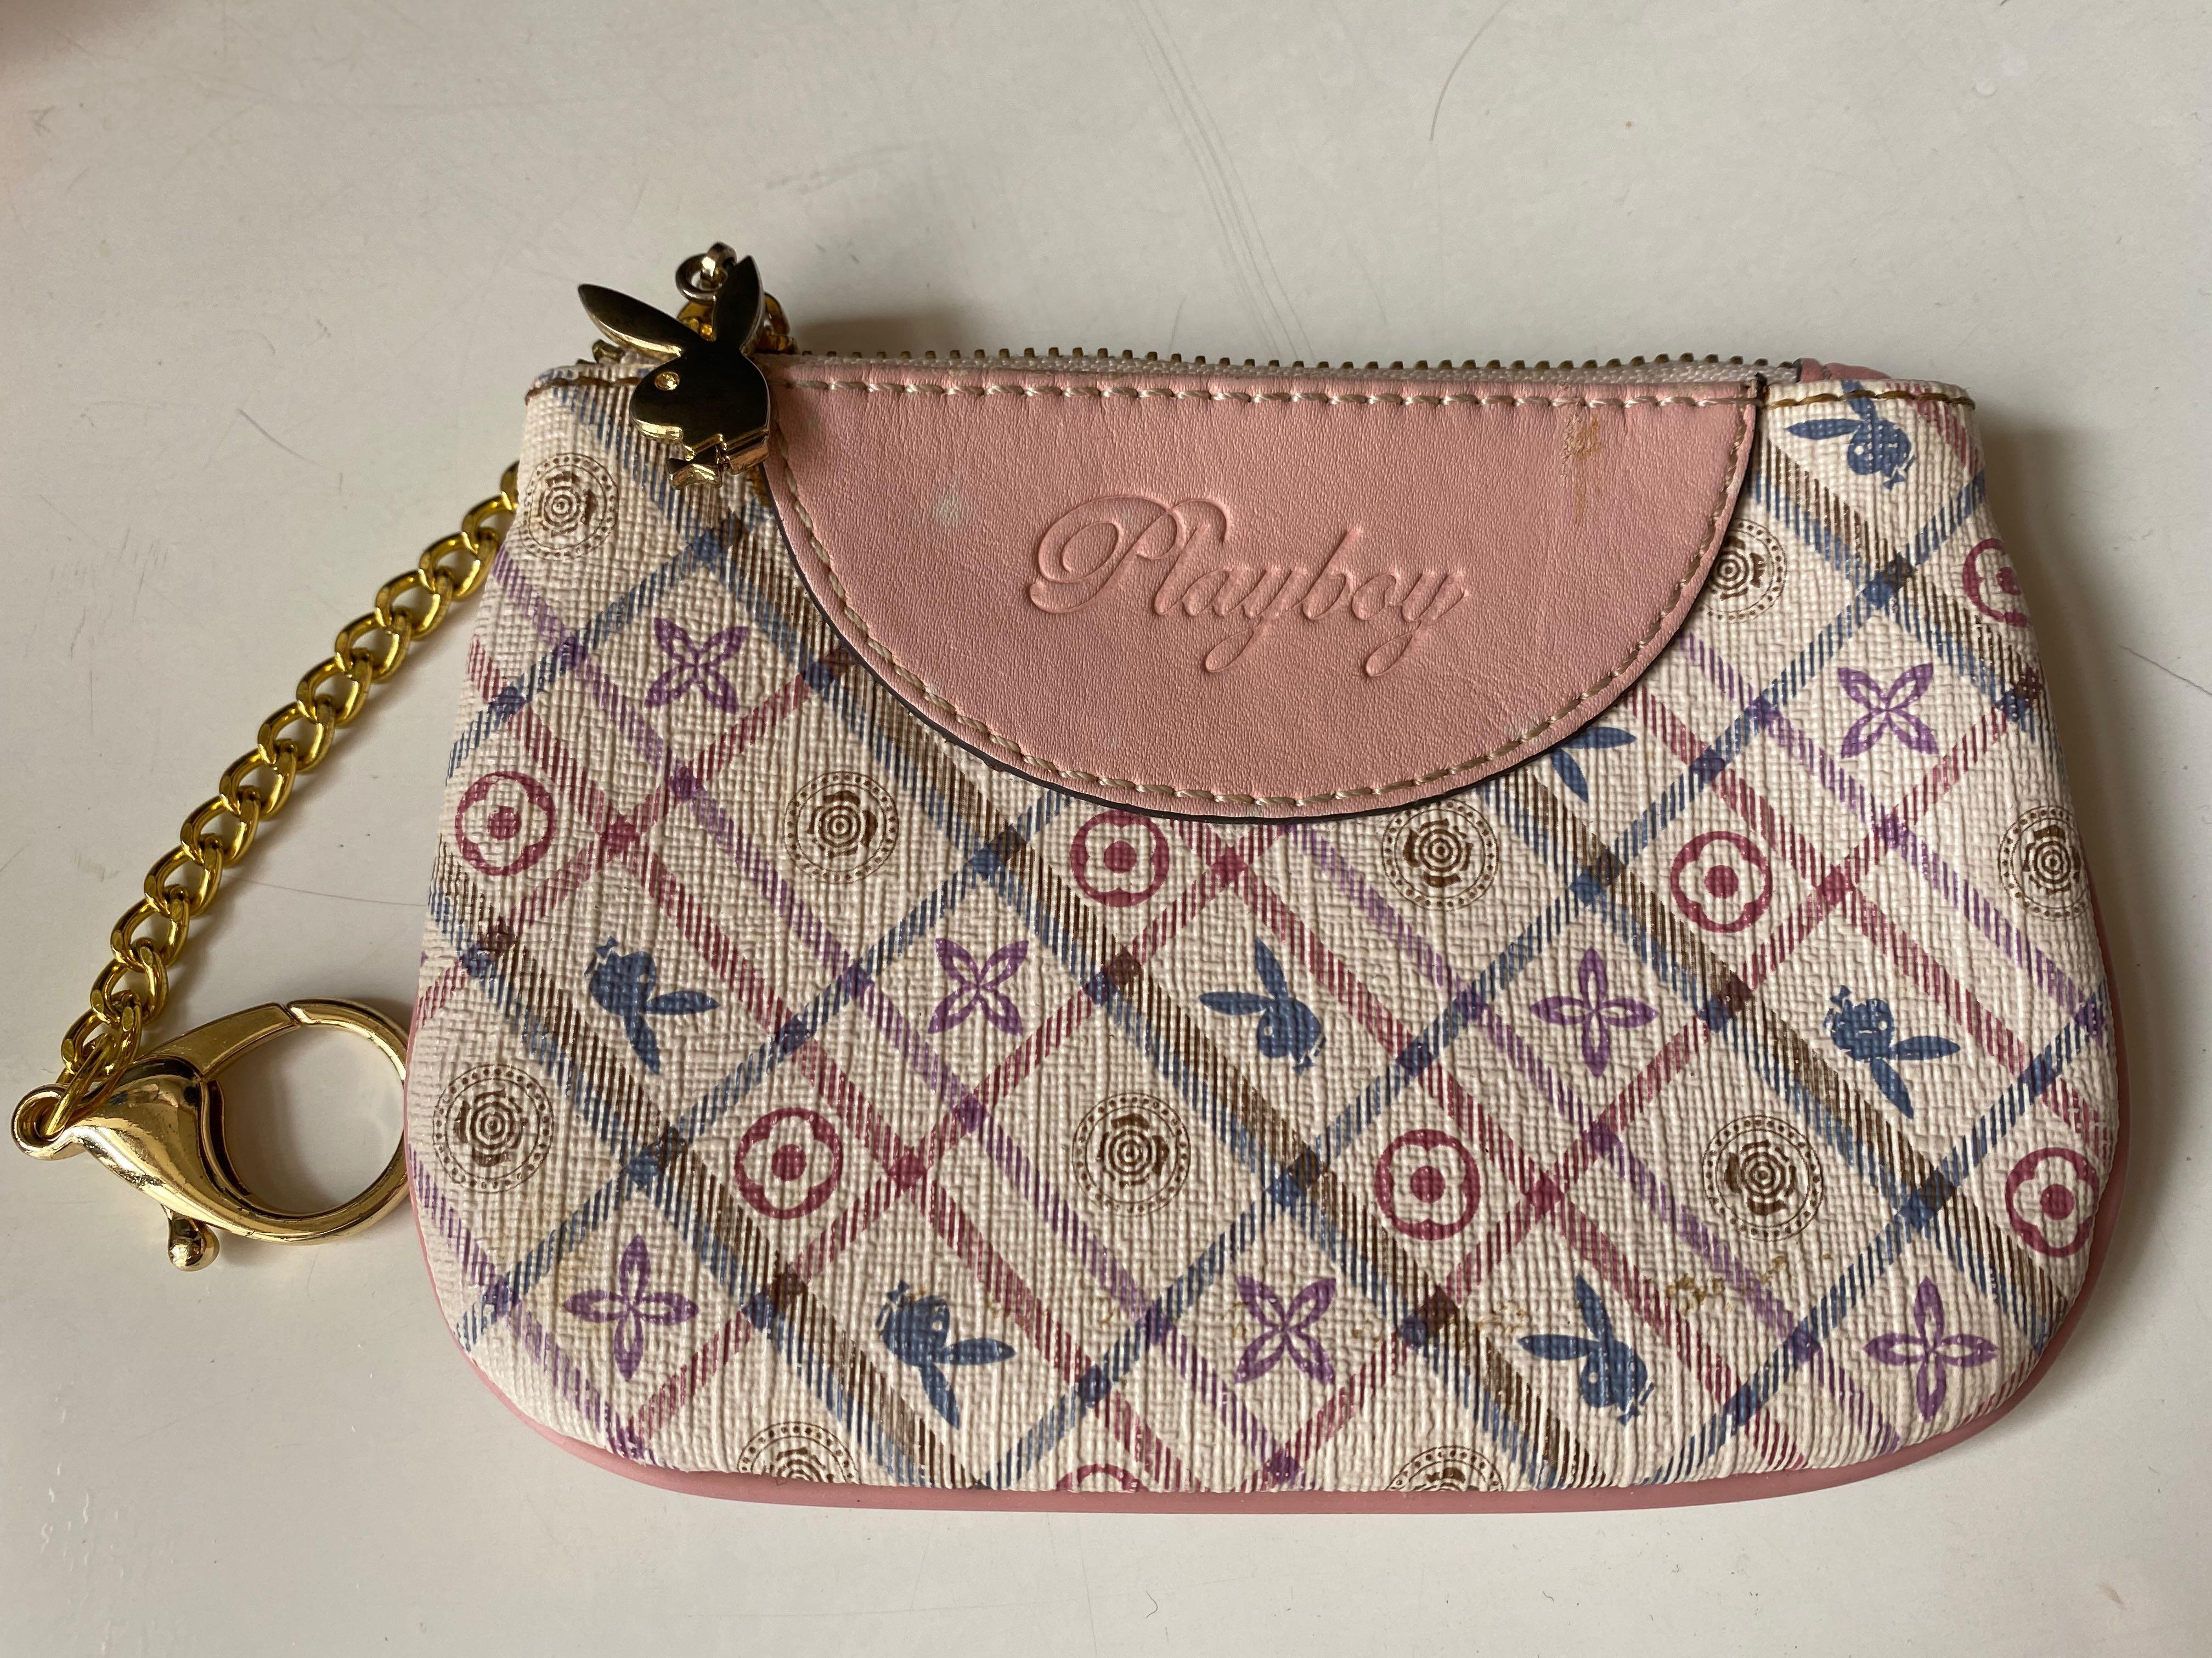 Playboy 粉色皮革零錢卡包